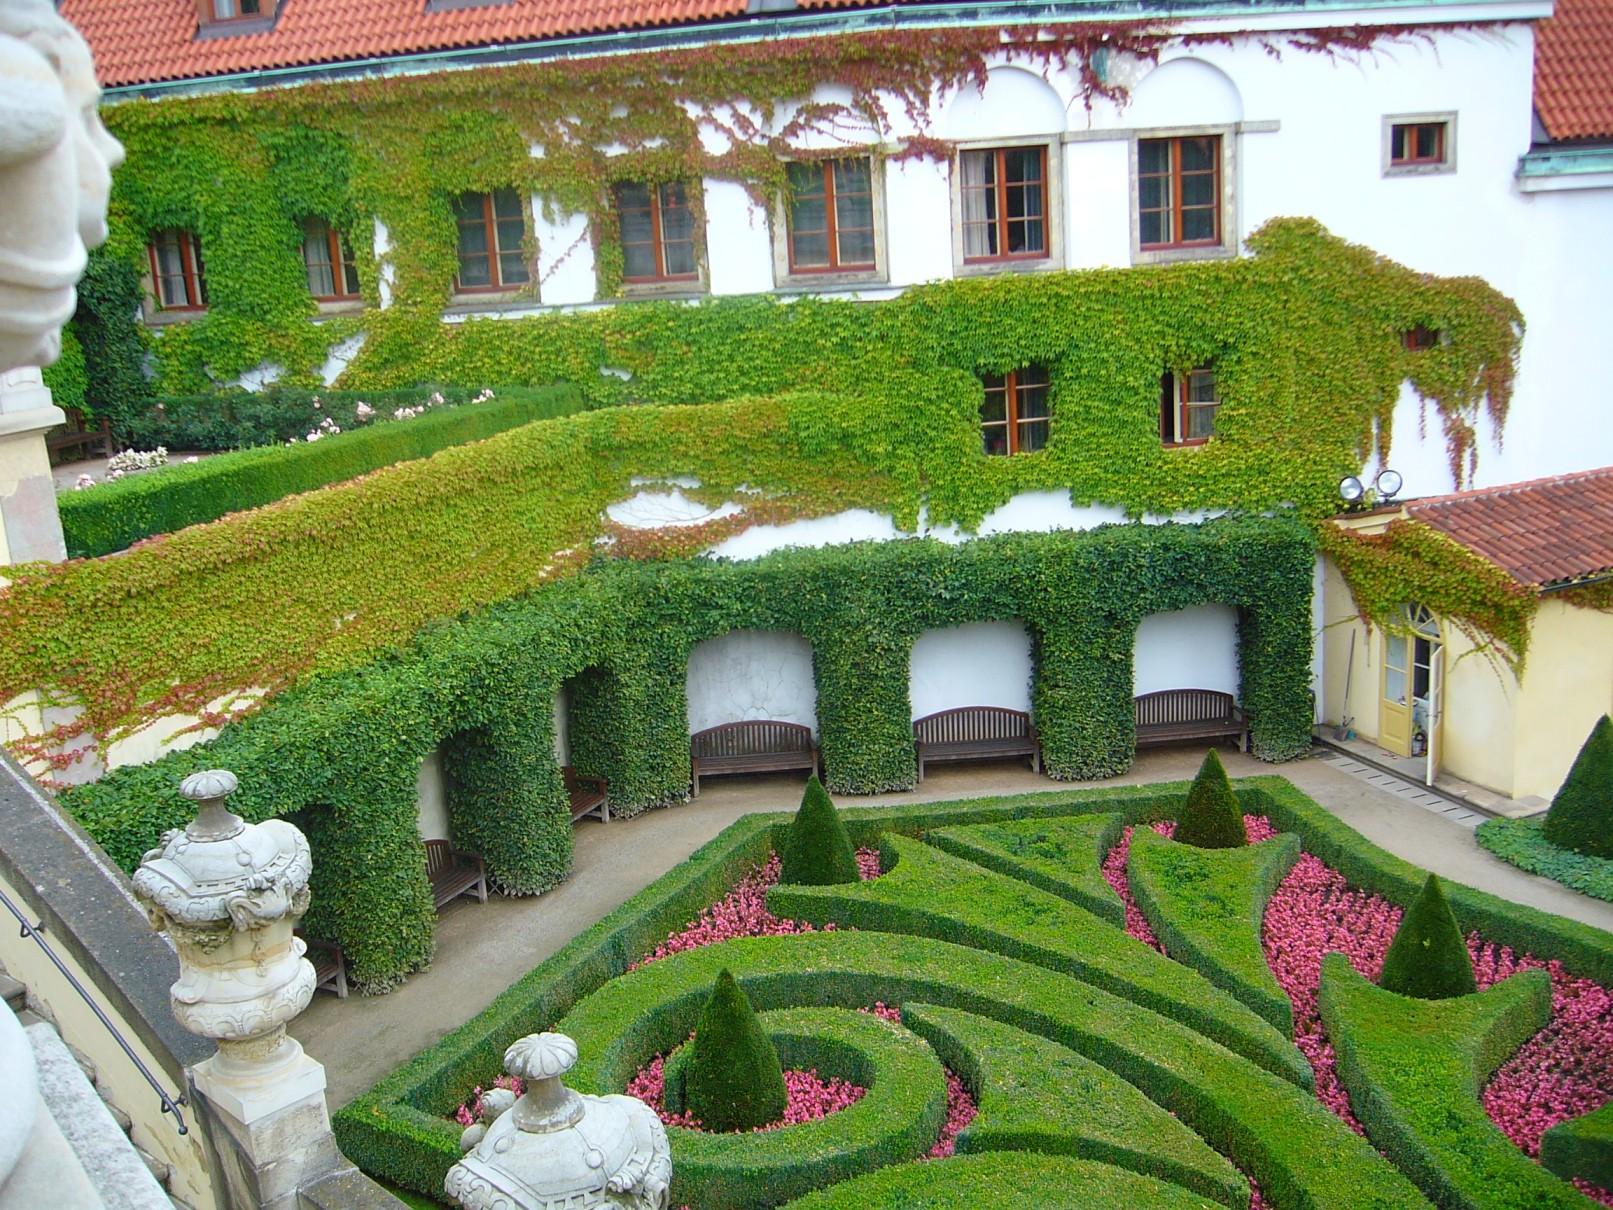 Vrtbovská zahrada - pohled na terasy